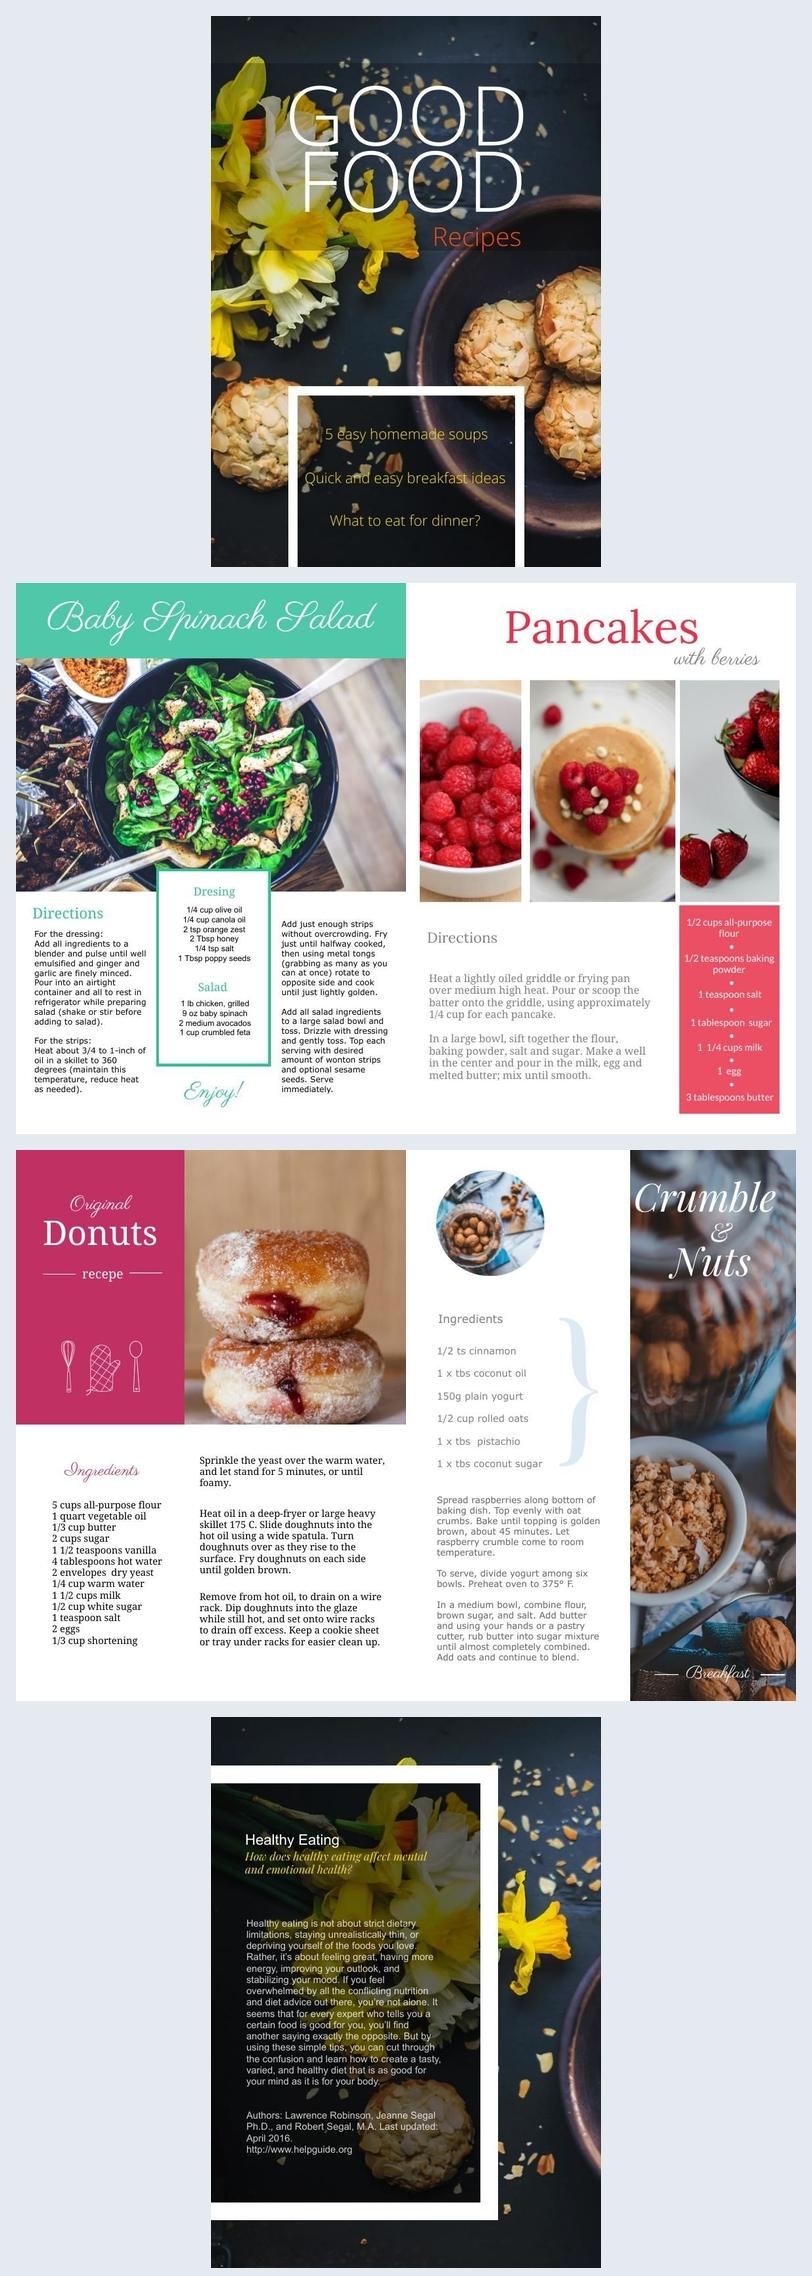 Diseño irresistible para libro de cocina